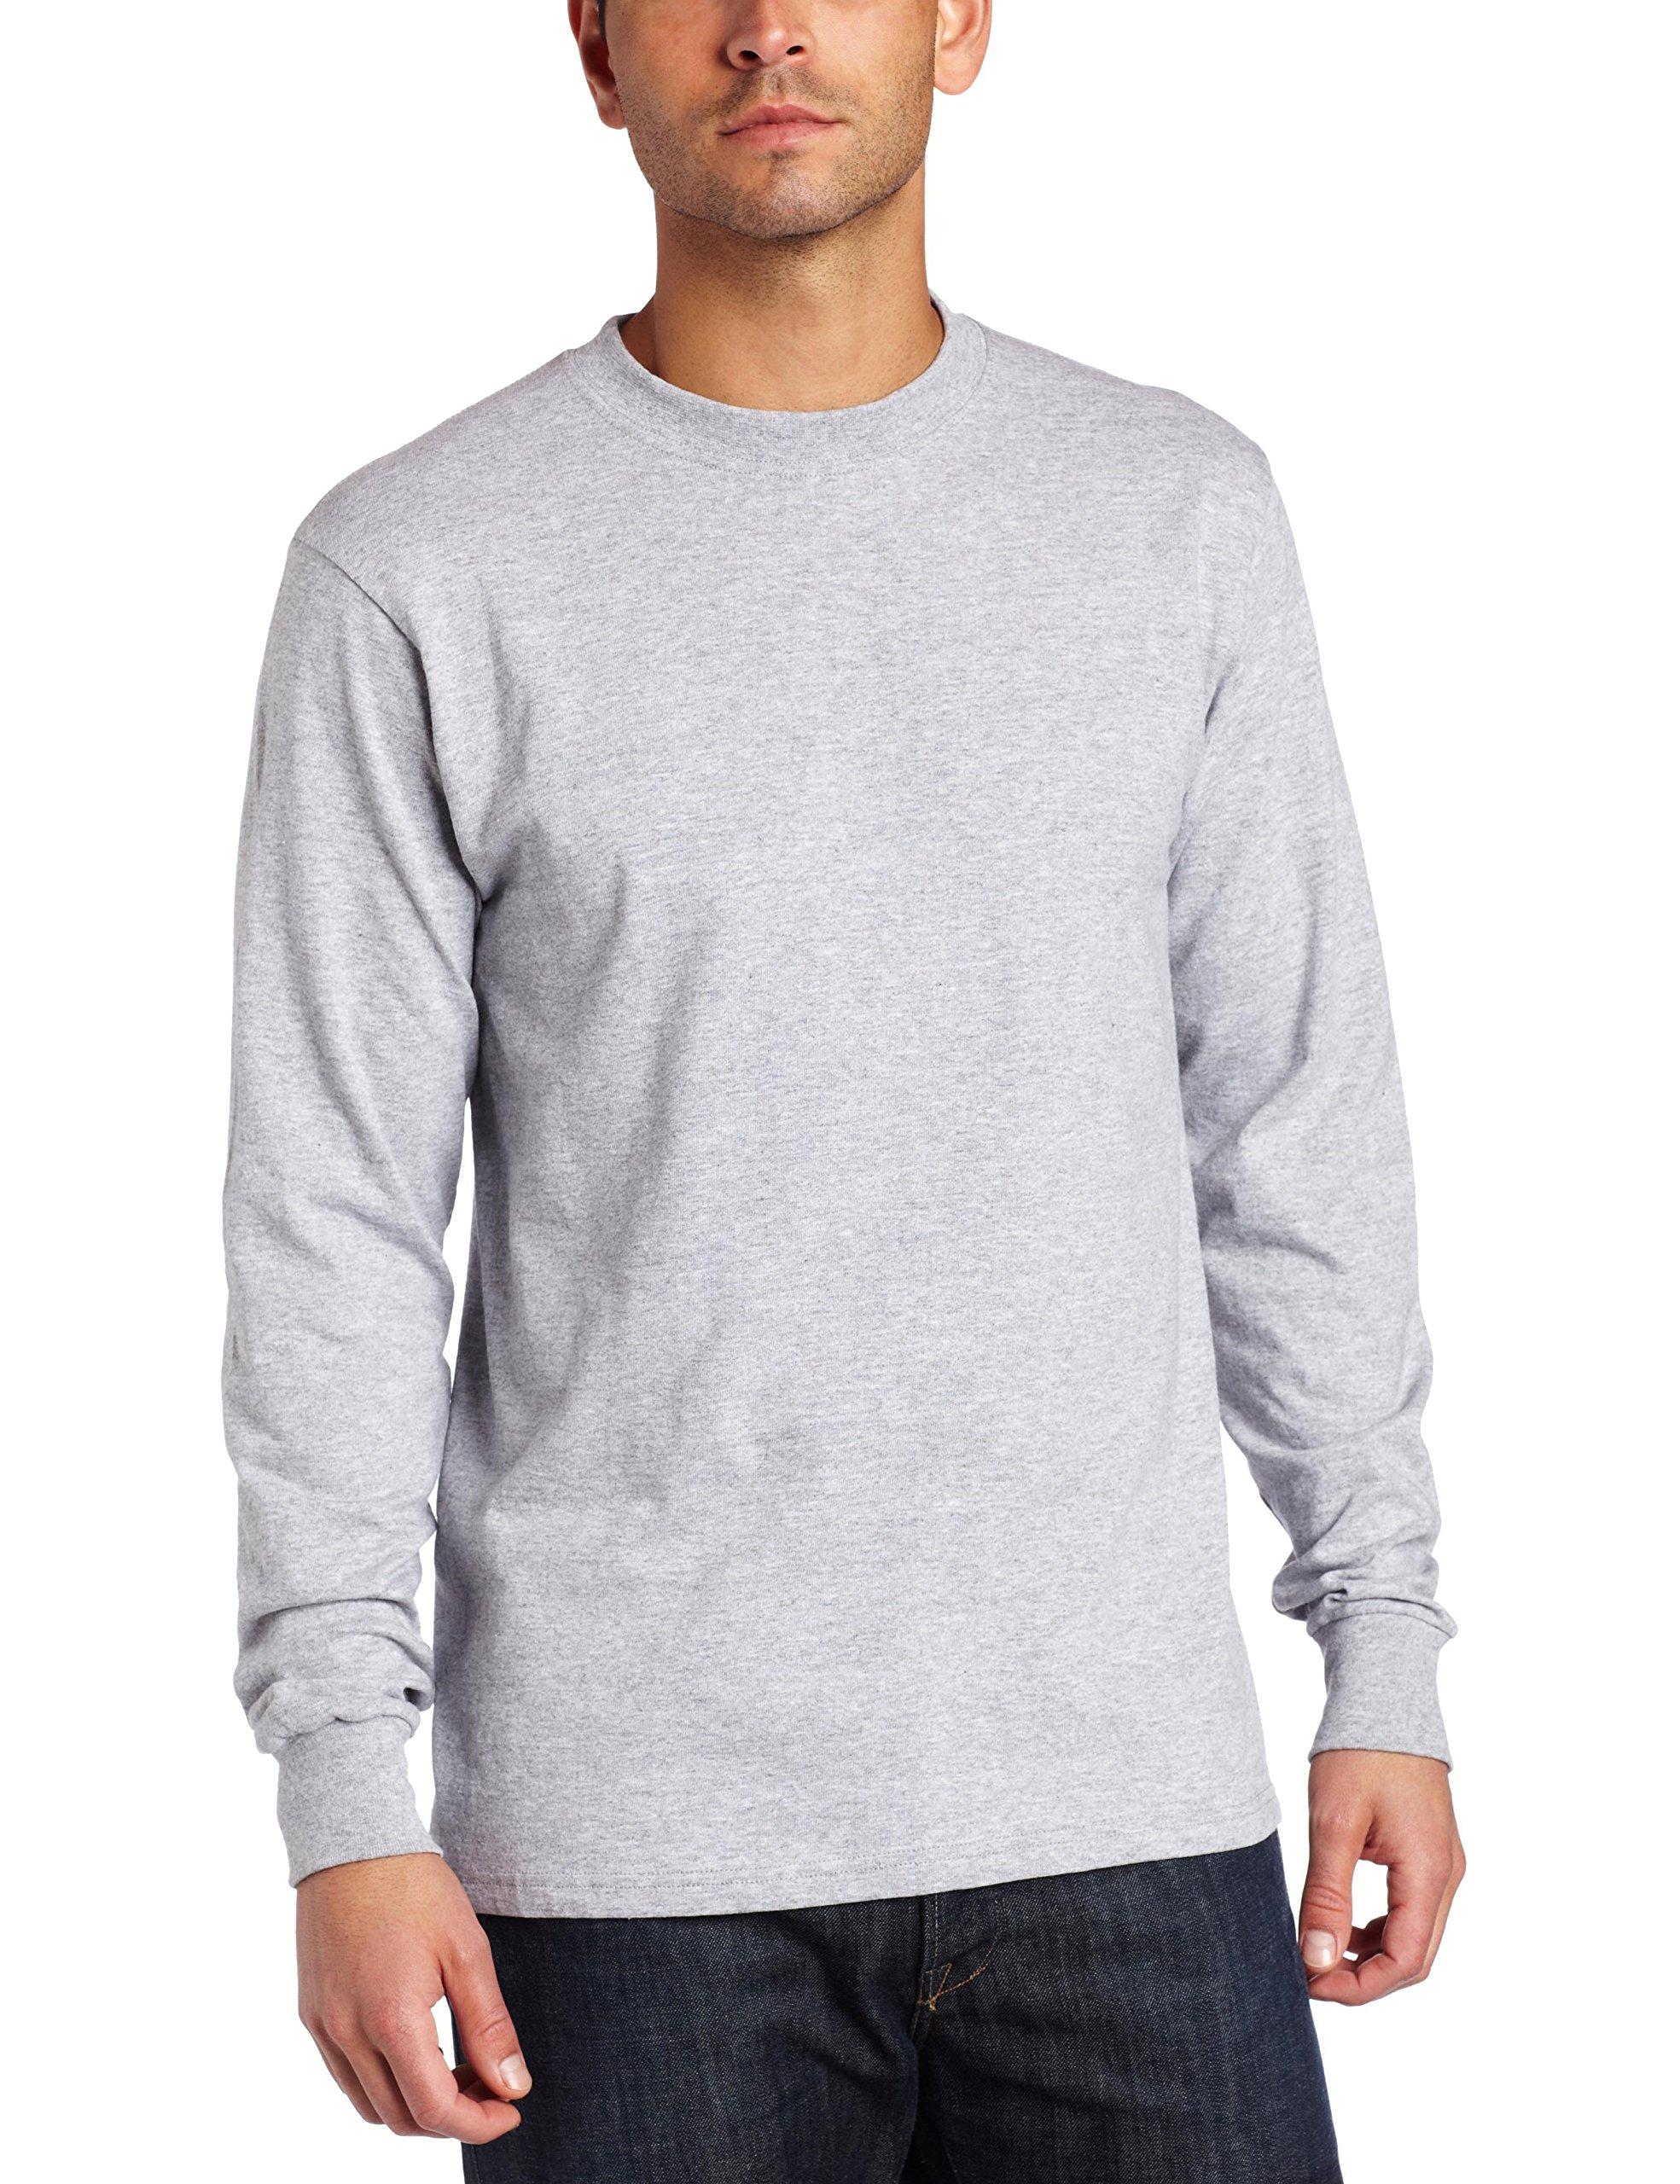 MJ Soffe Men's Long-Sleeve Cotton T-Shirt, Oxford, Large